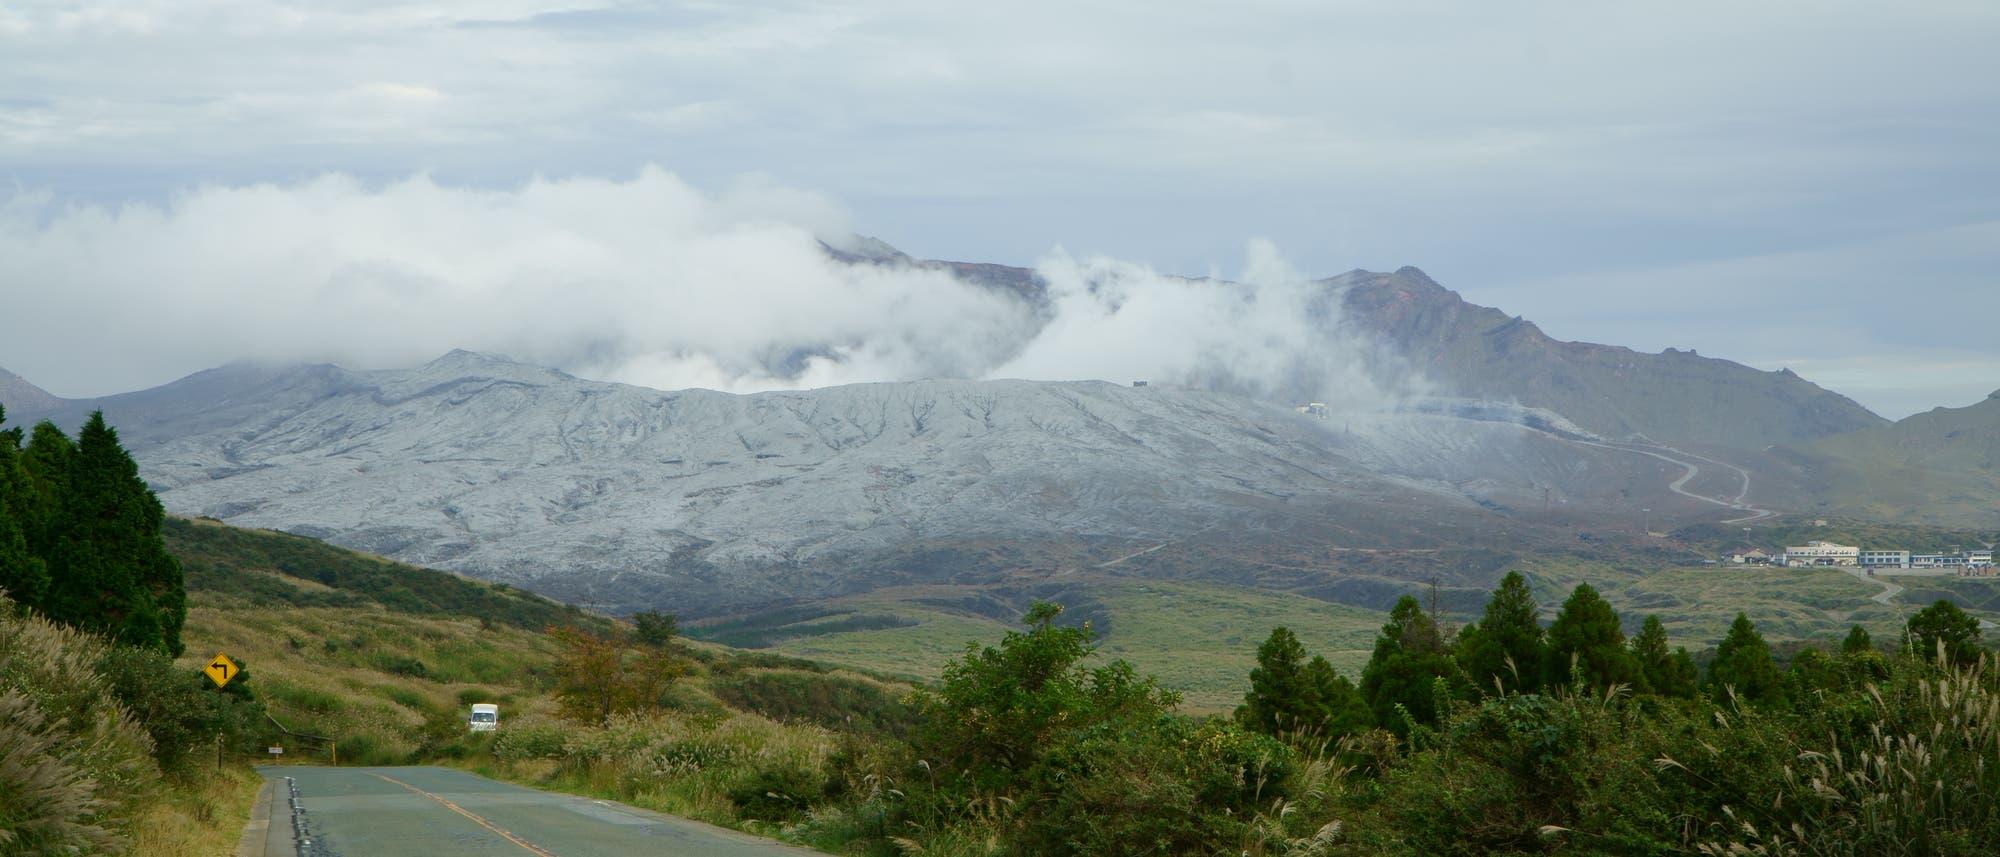 Ein junger, recht großer Vulkan aus dunklem Auswurf in grüner japanischer Landschaft